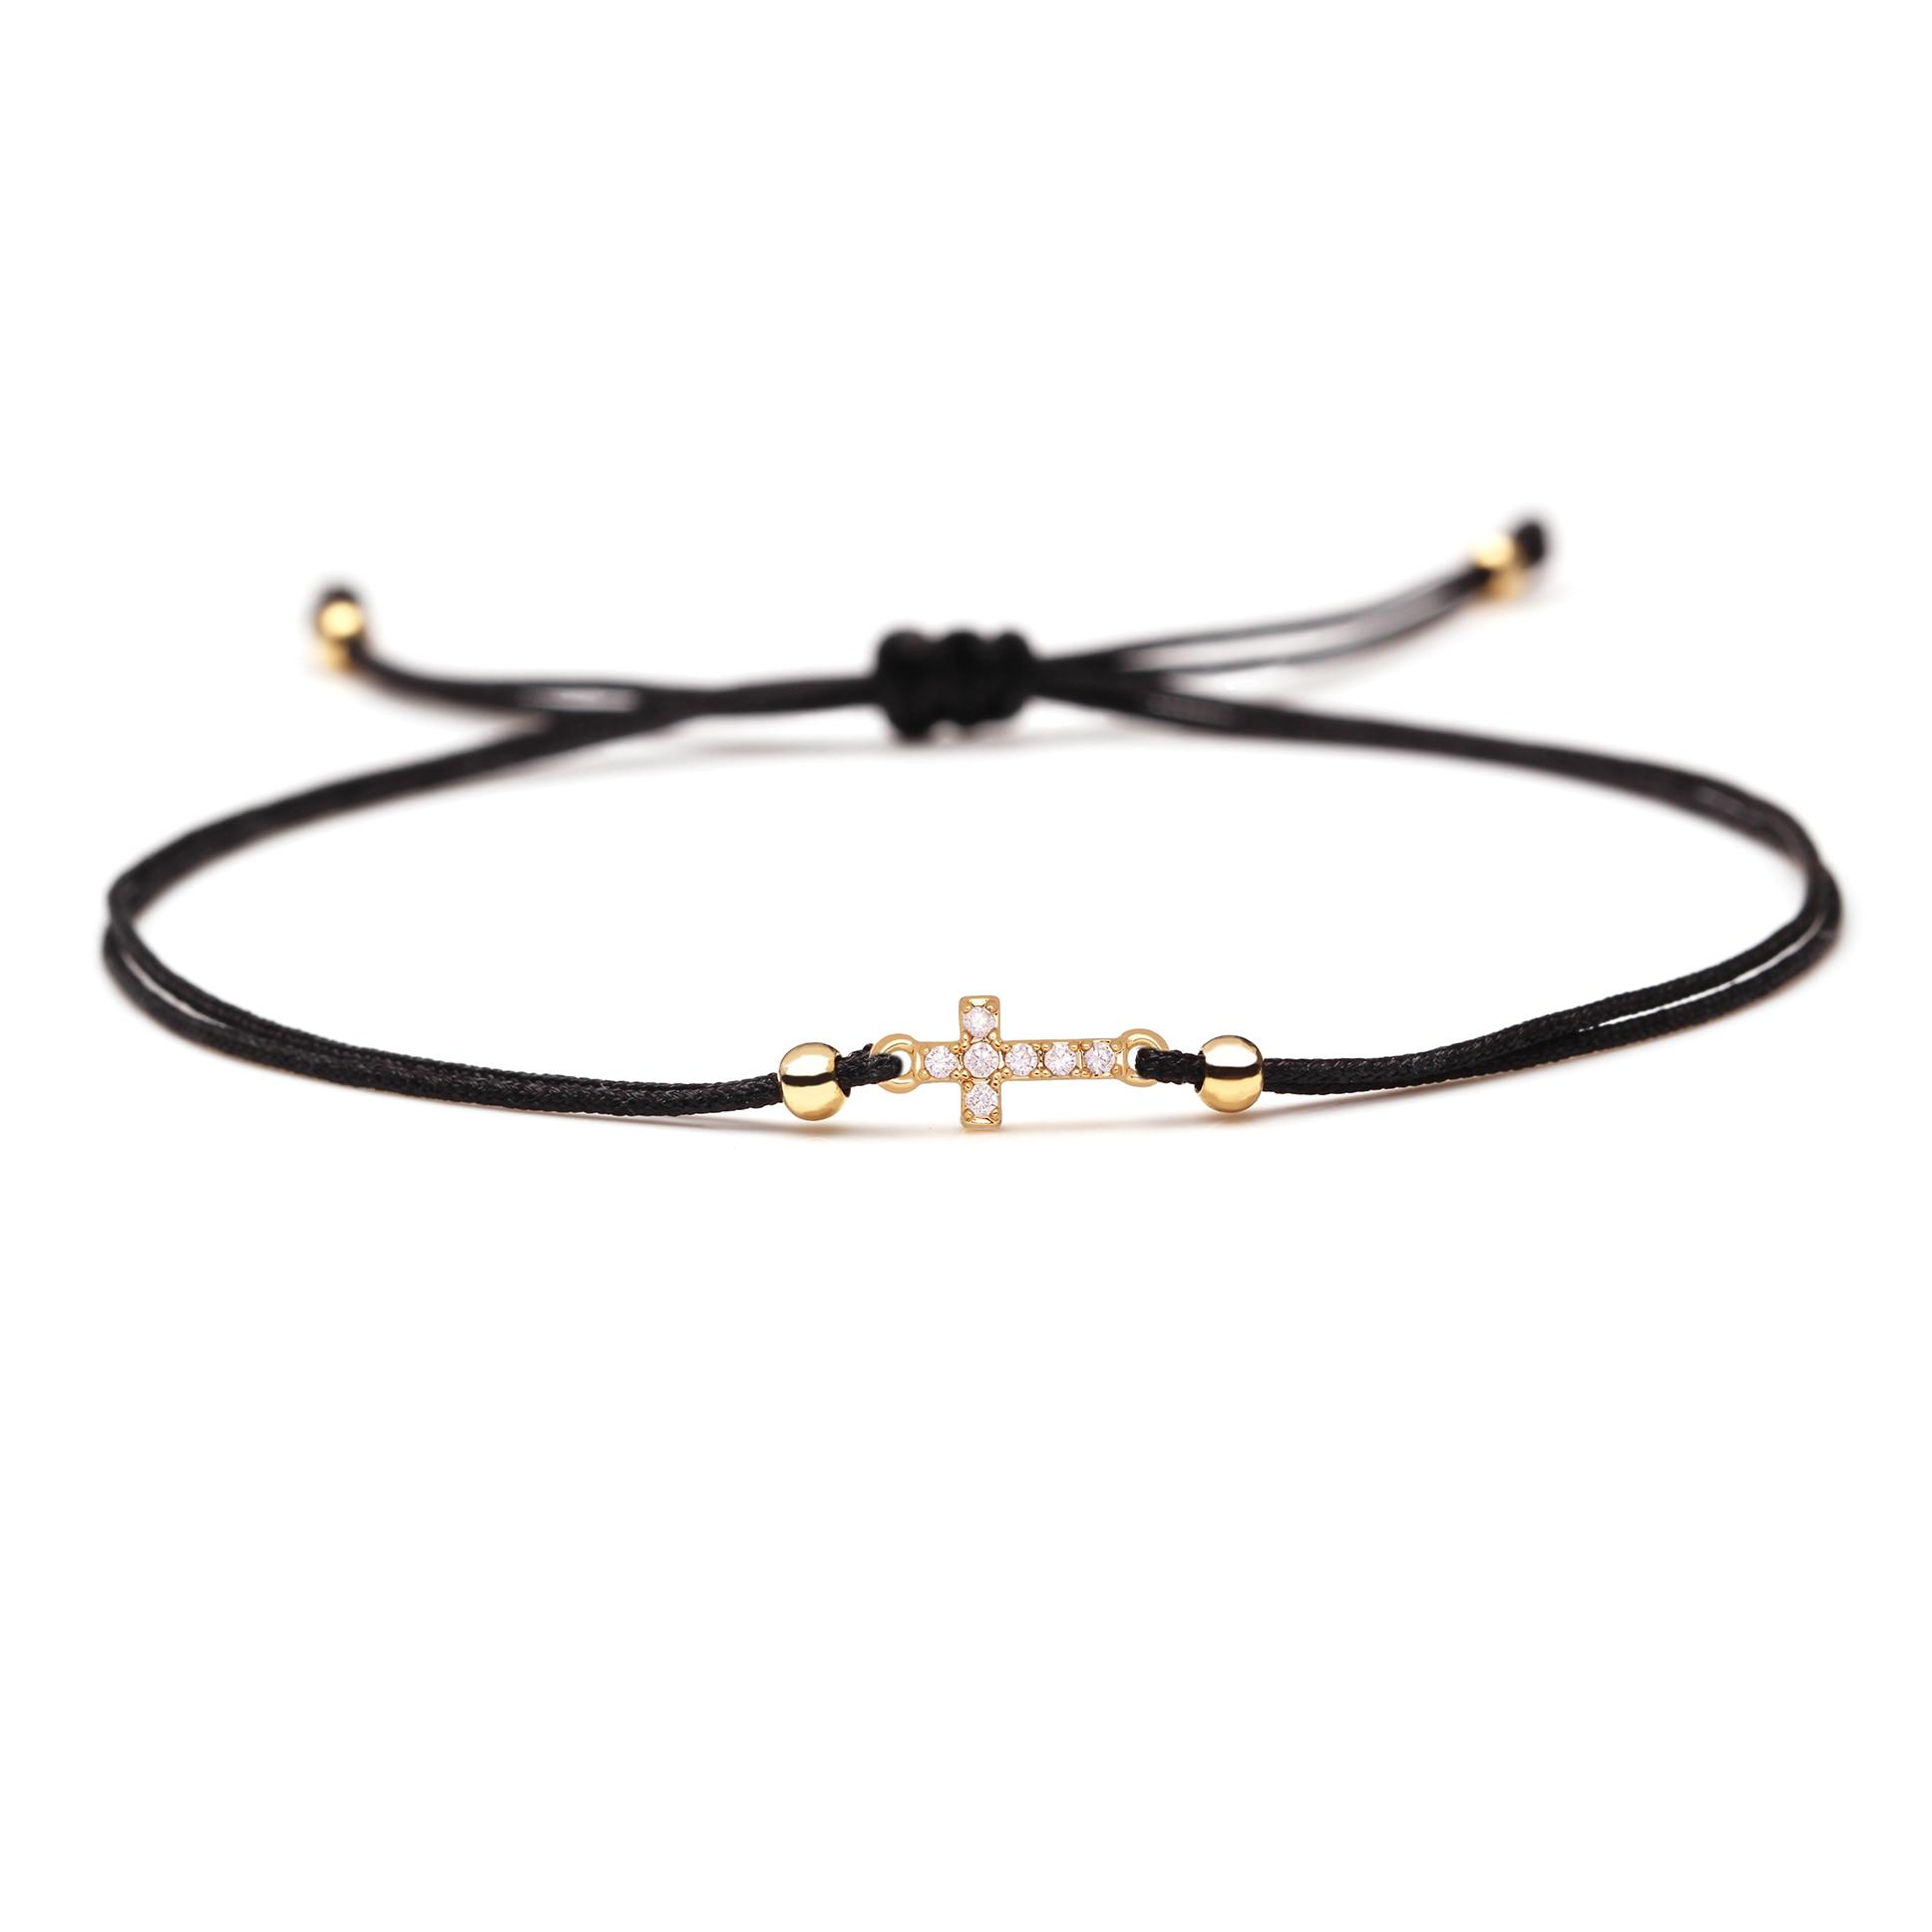 Mini Copper Cross CZ Crystal Silk Thread Braided Bracelets Women Men High Quality Black Pink Red String Tiny Zircon Jewelry Her